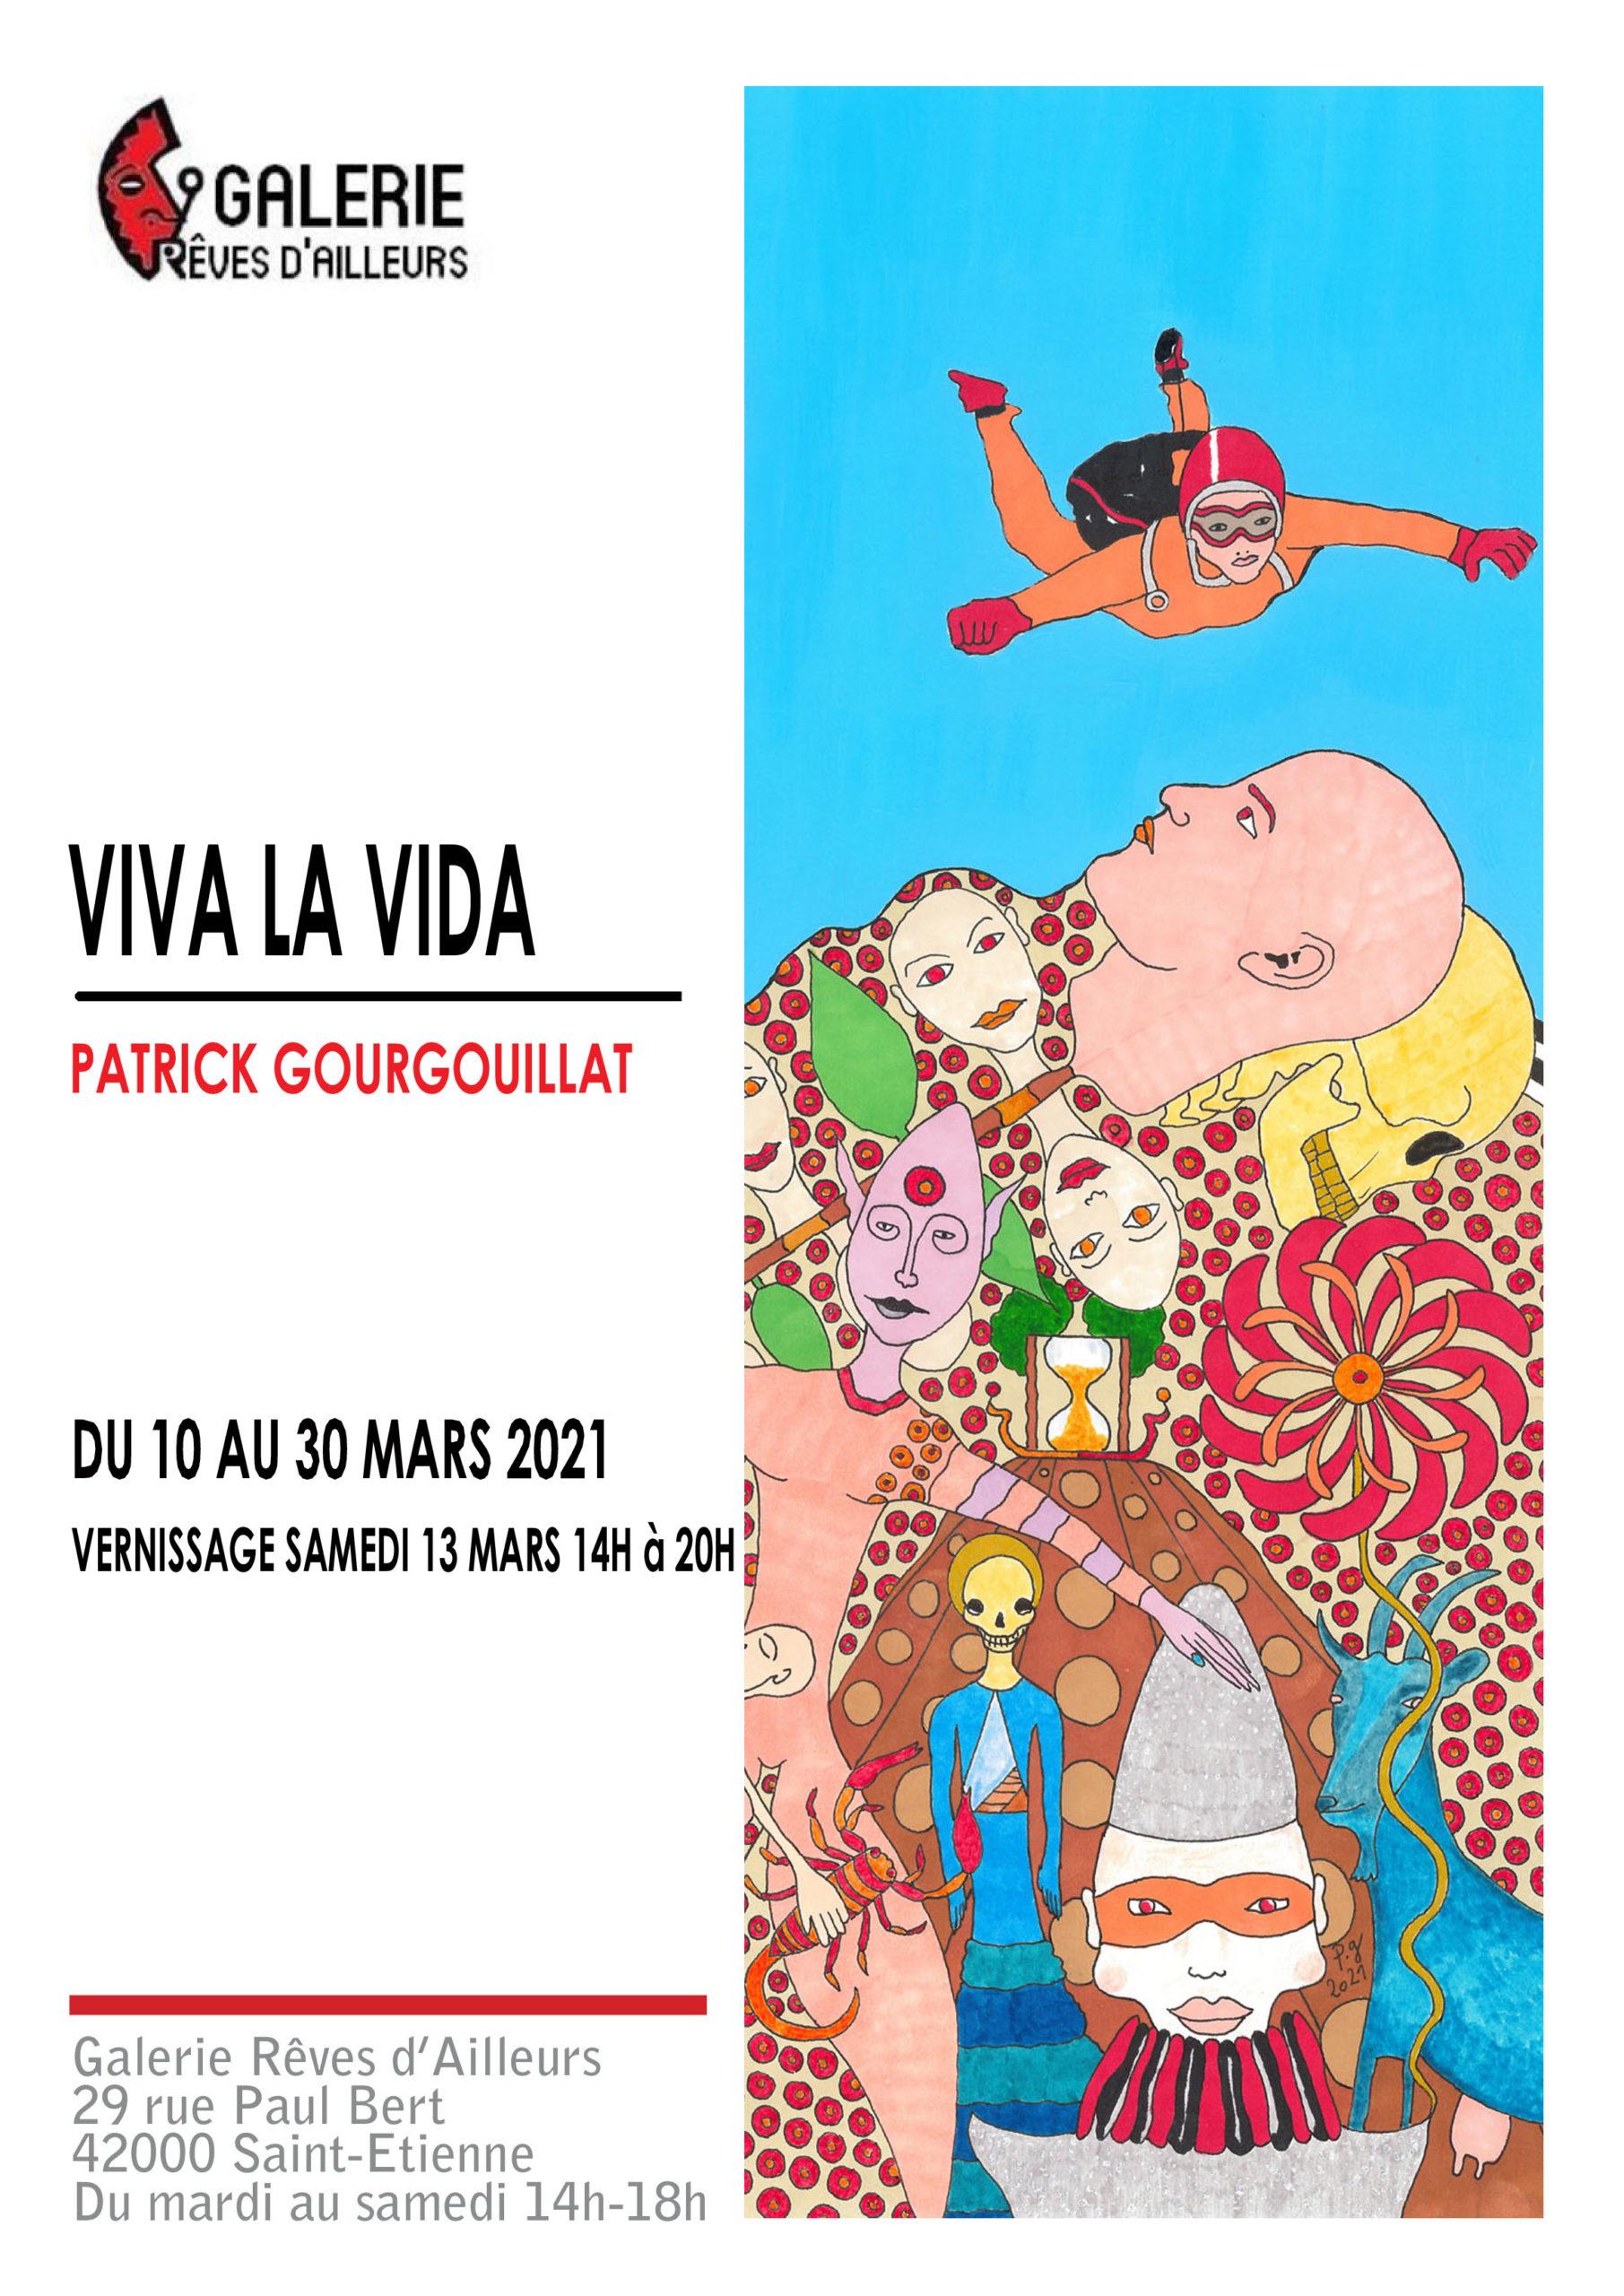 Patrick Gourgouillat - Exposition Galerie Rêves d'Ailleurs - mars 2021